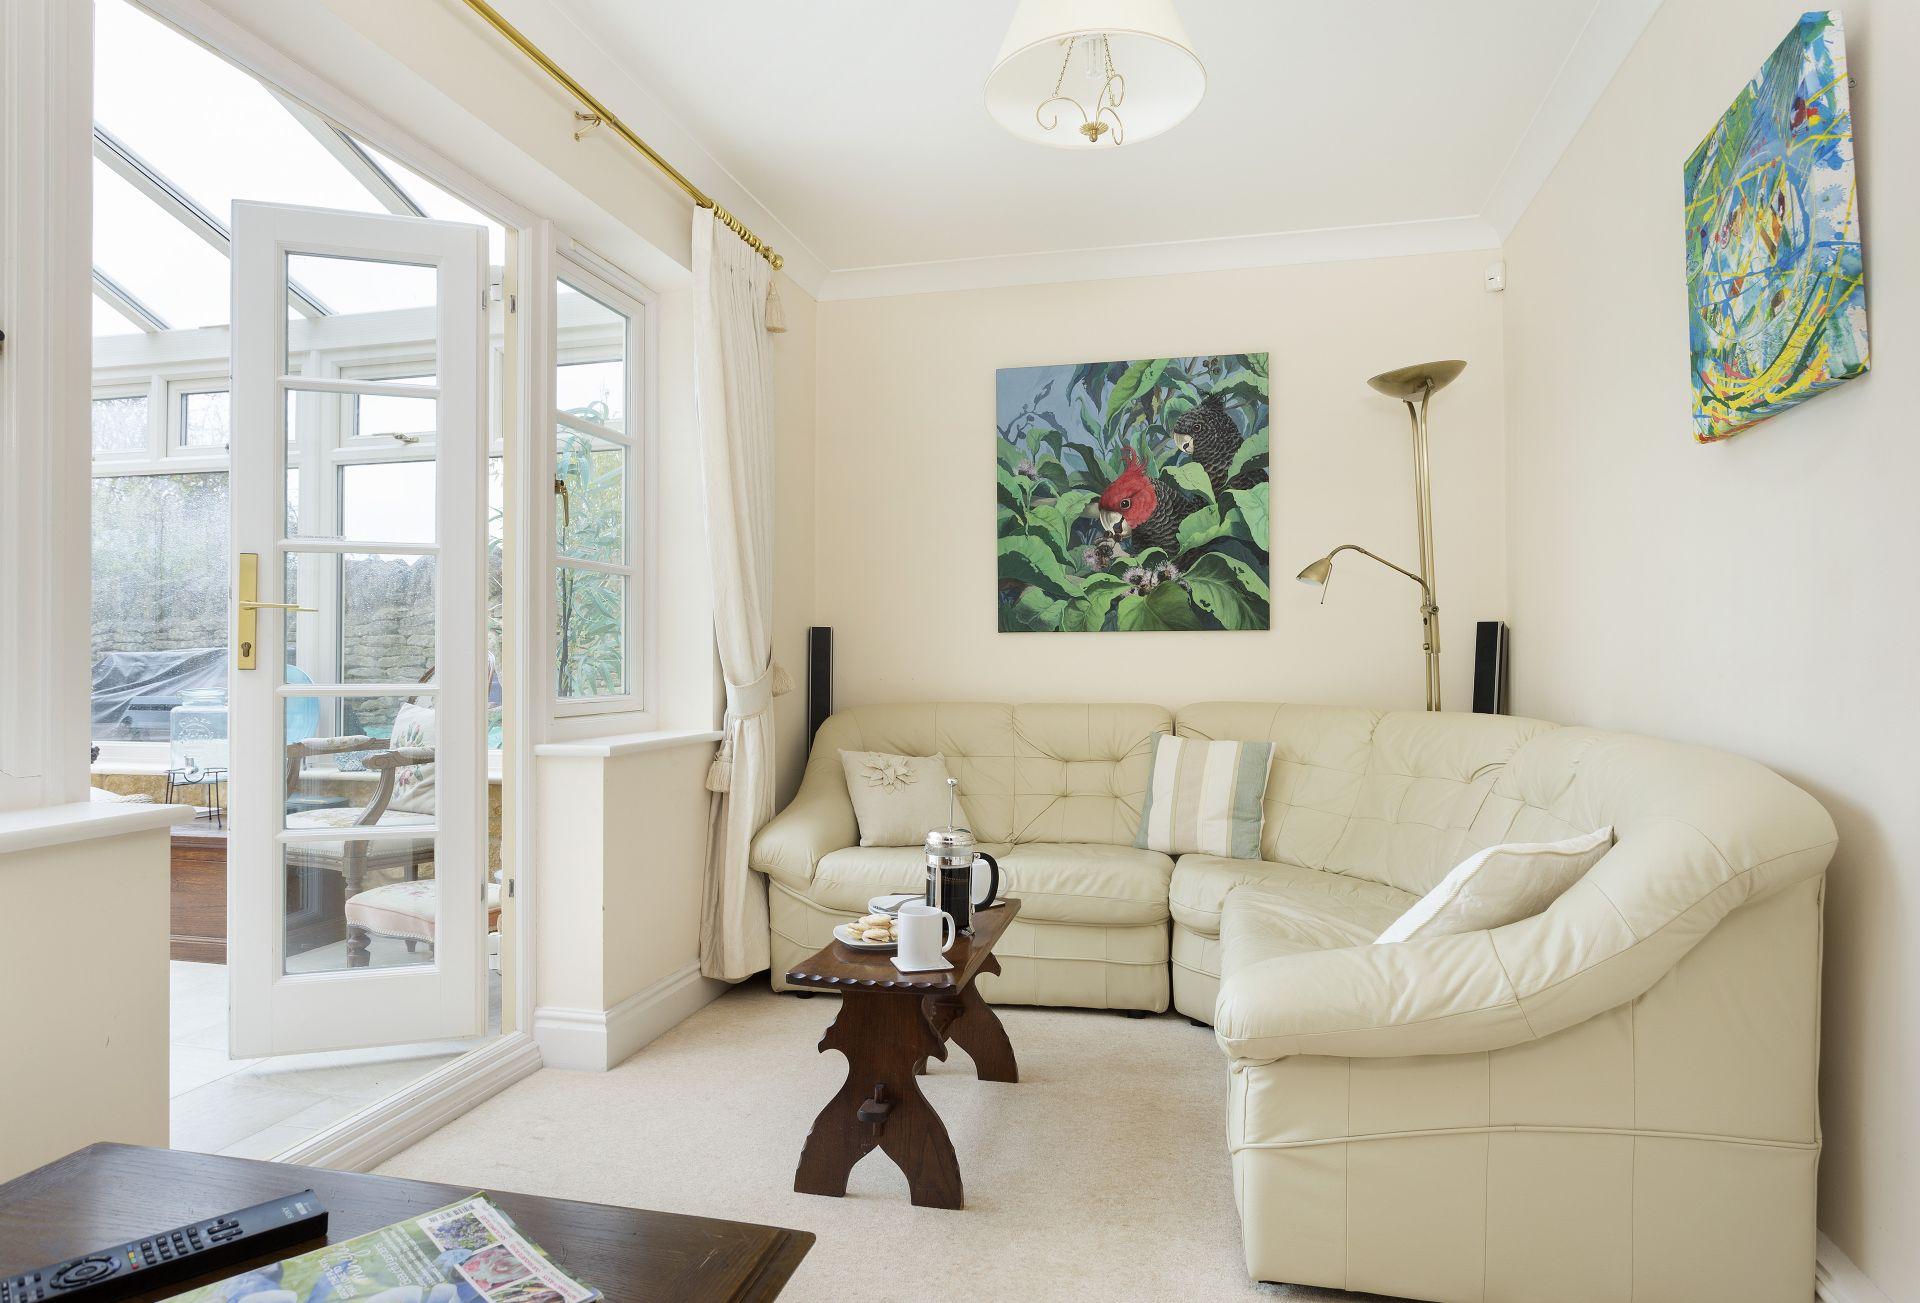 Ground floor: Comfortable seating area in the garden room